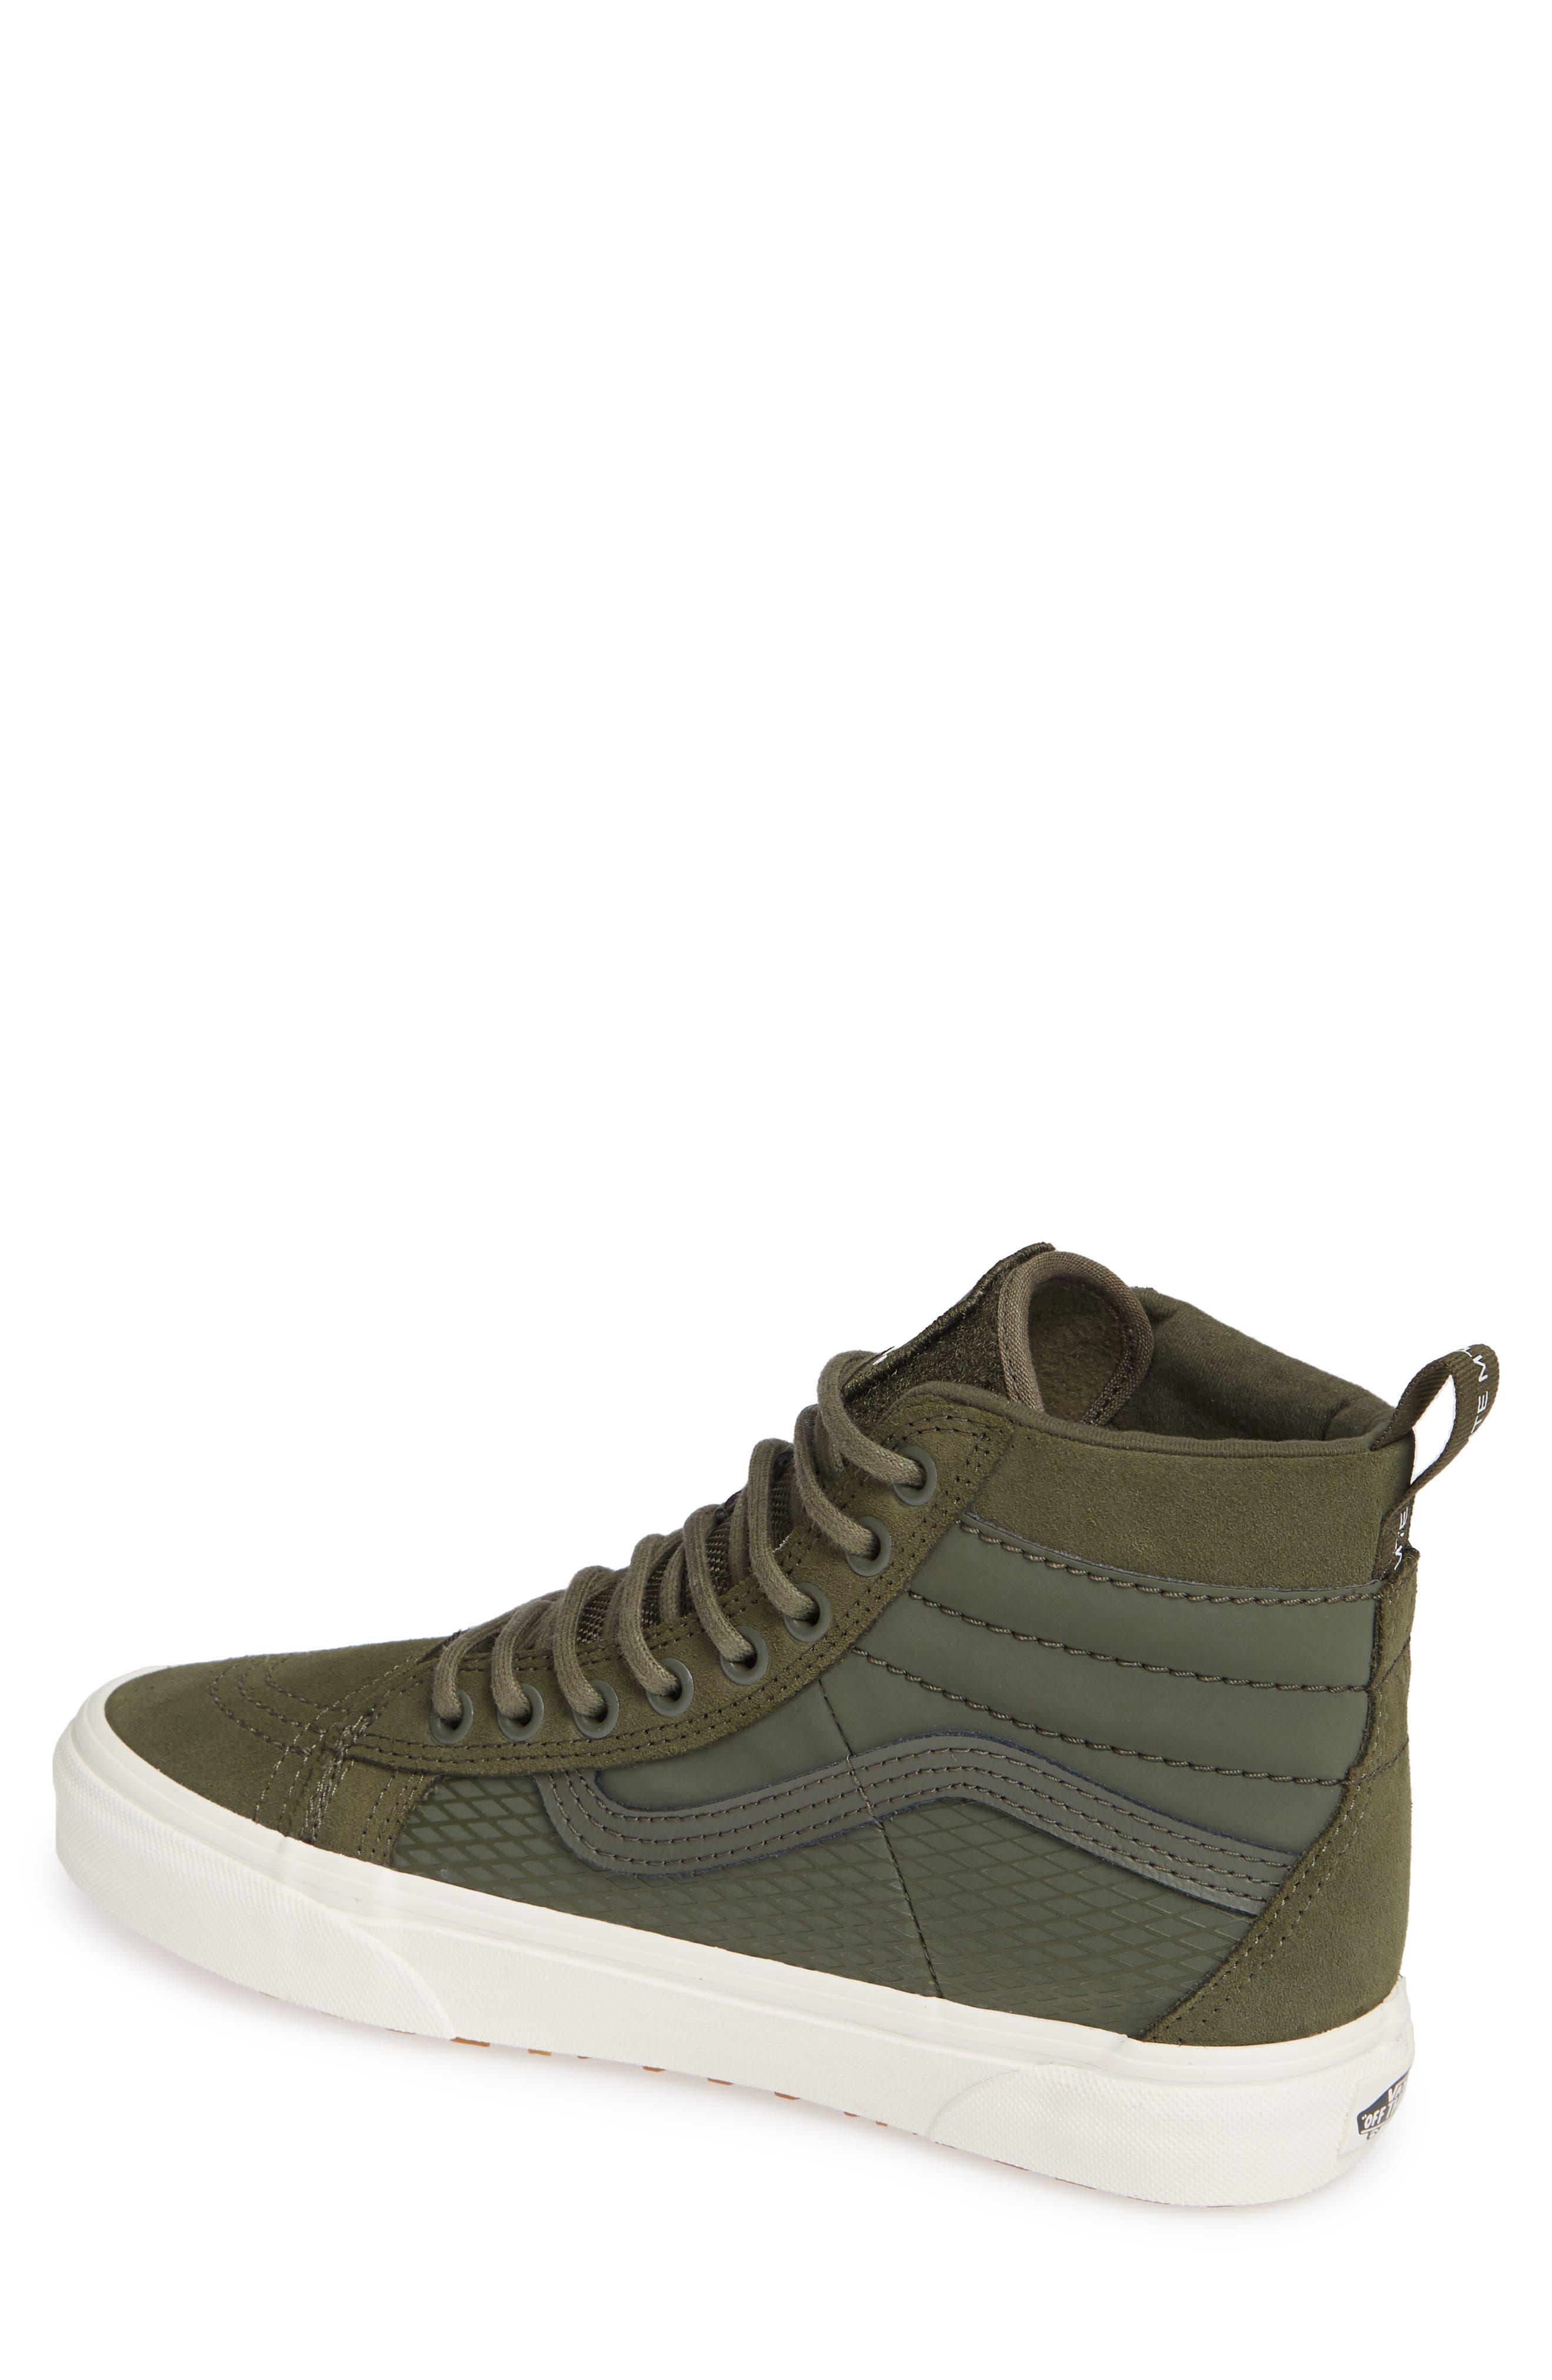 Sk8-Hi 46 MTE DX Sneaker,                             Alternate thumbnail 2, color,                             GRAPE LEAF